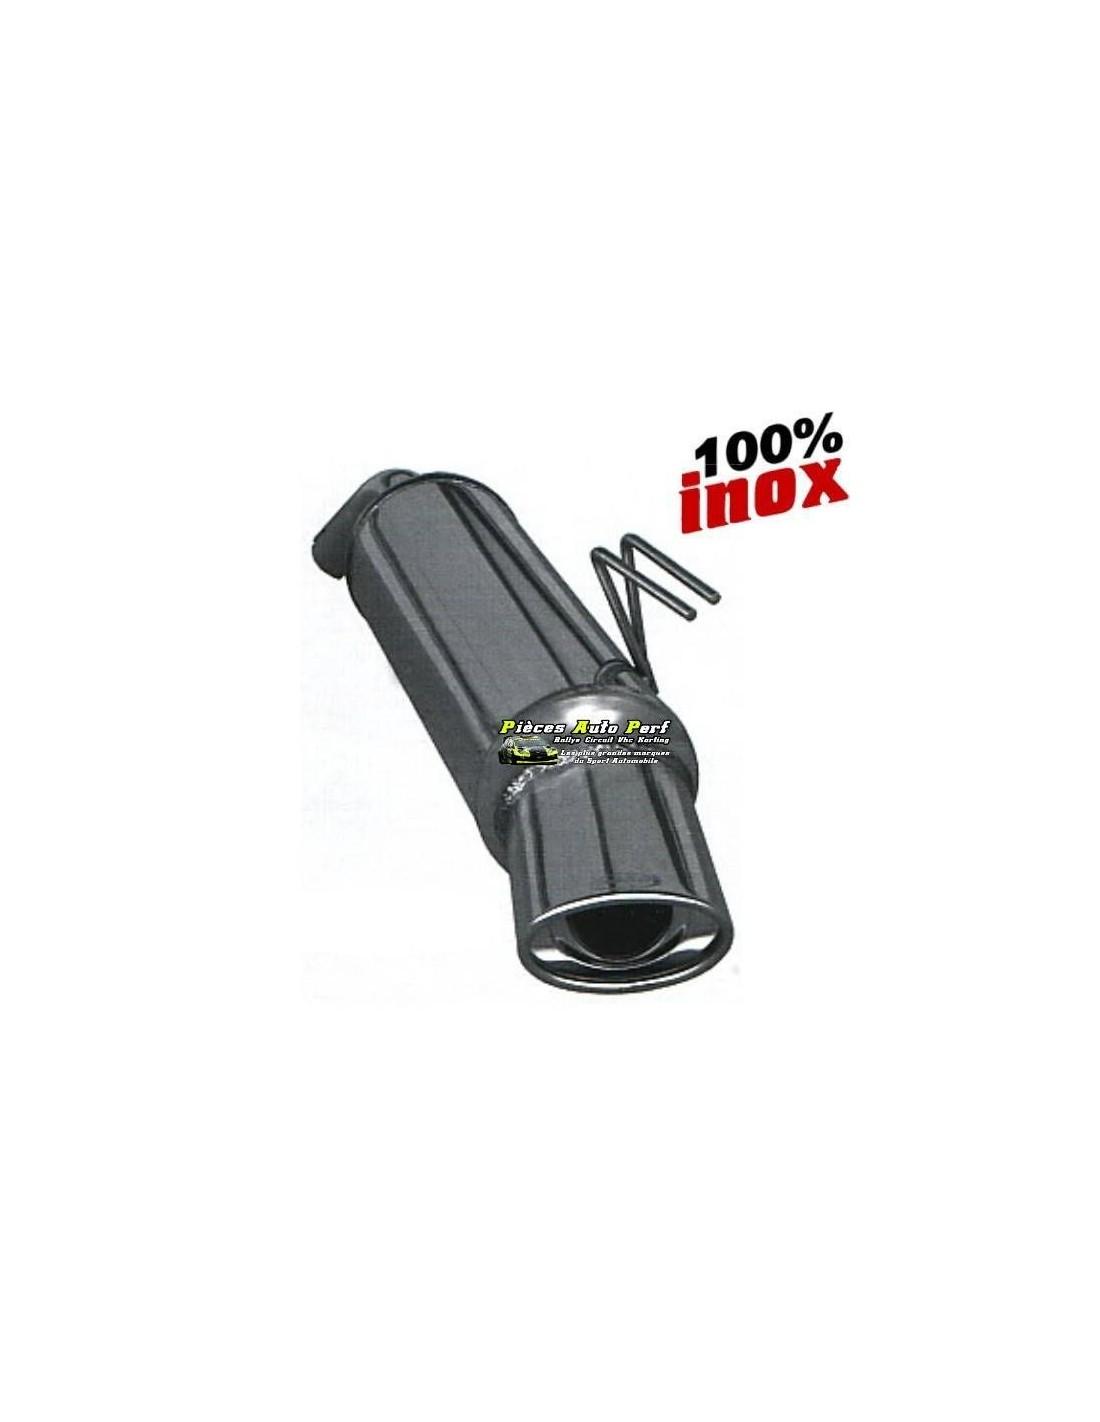 silencieux sportif inox simple sortie ovale 120x80mm renault twingo 1l6 16v rs. Black Bedroom Furniture Sets. Home Design Ideas